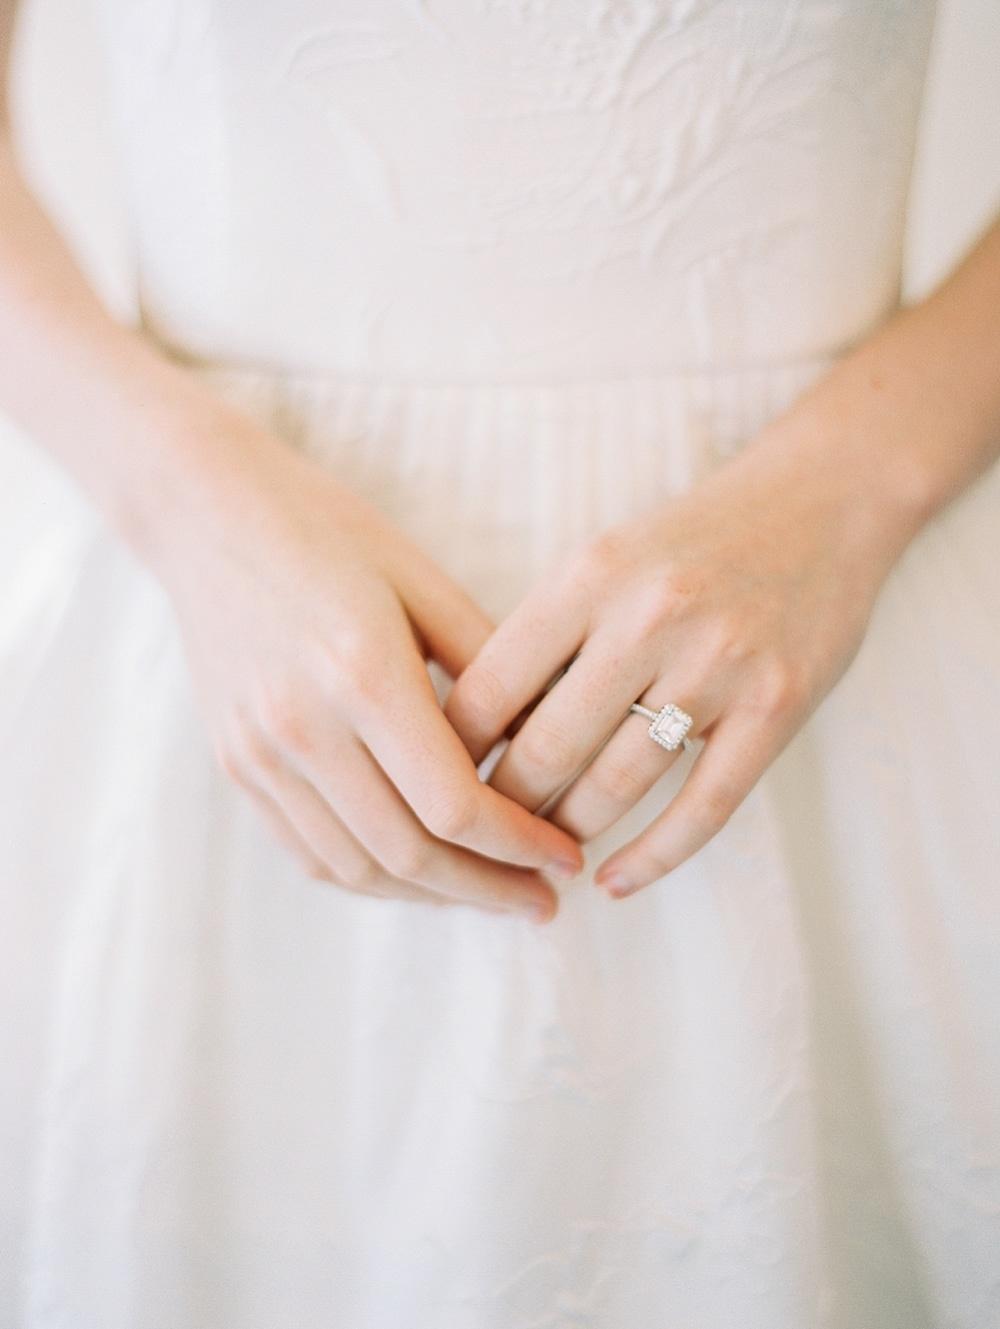 kristin-la-voie-photography-austin-wedding-photographer-woodbine-mansion-21